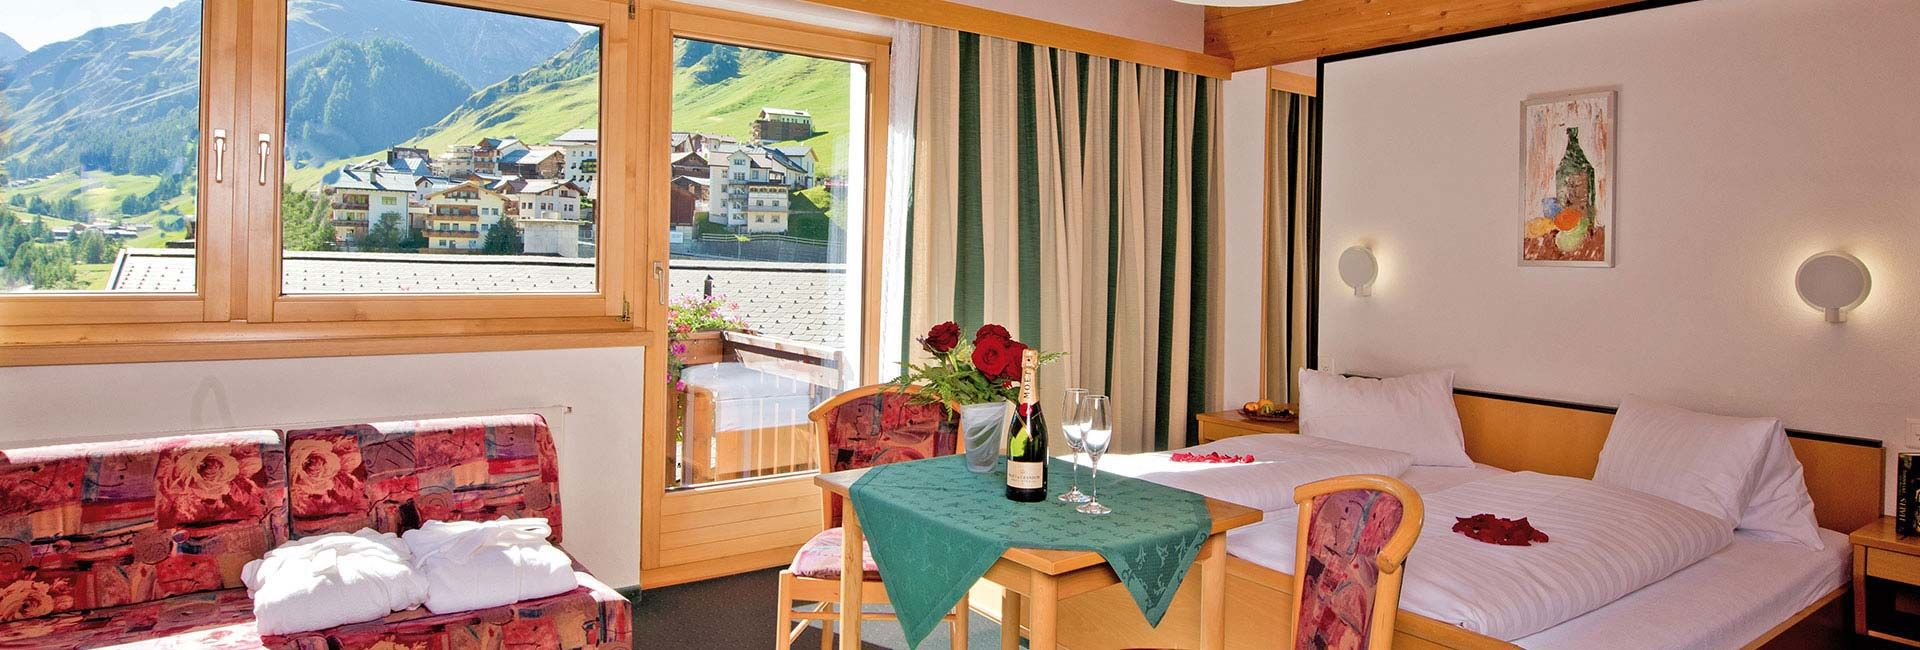 Samnaun Zimmer Dependance im Hotel Romantica